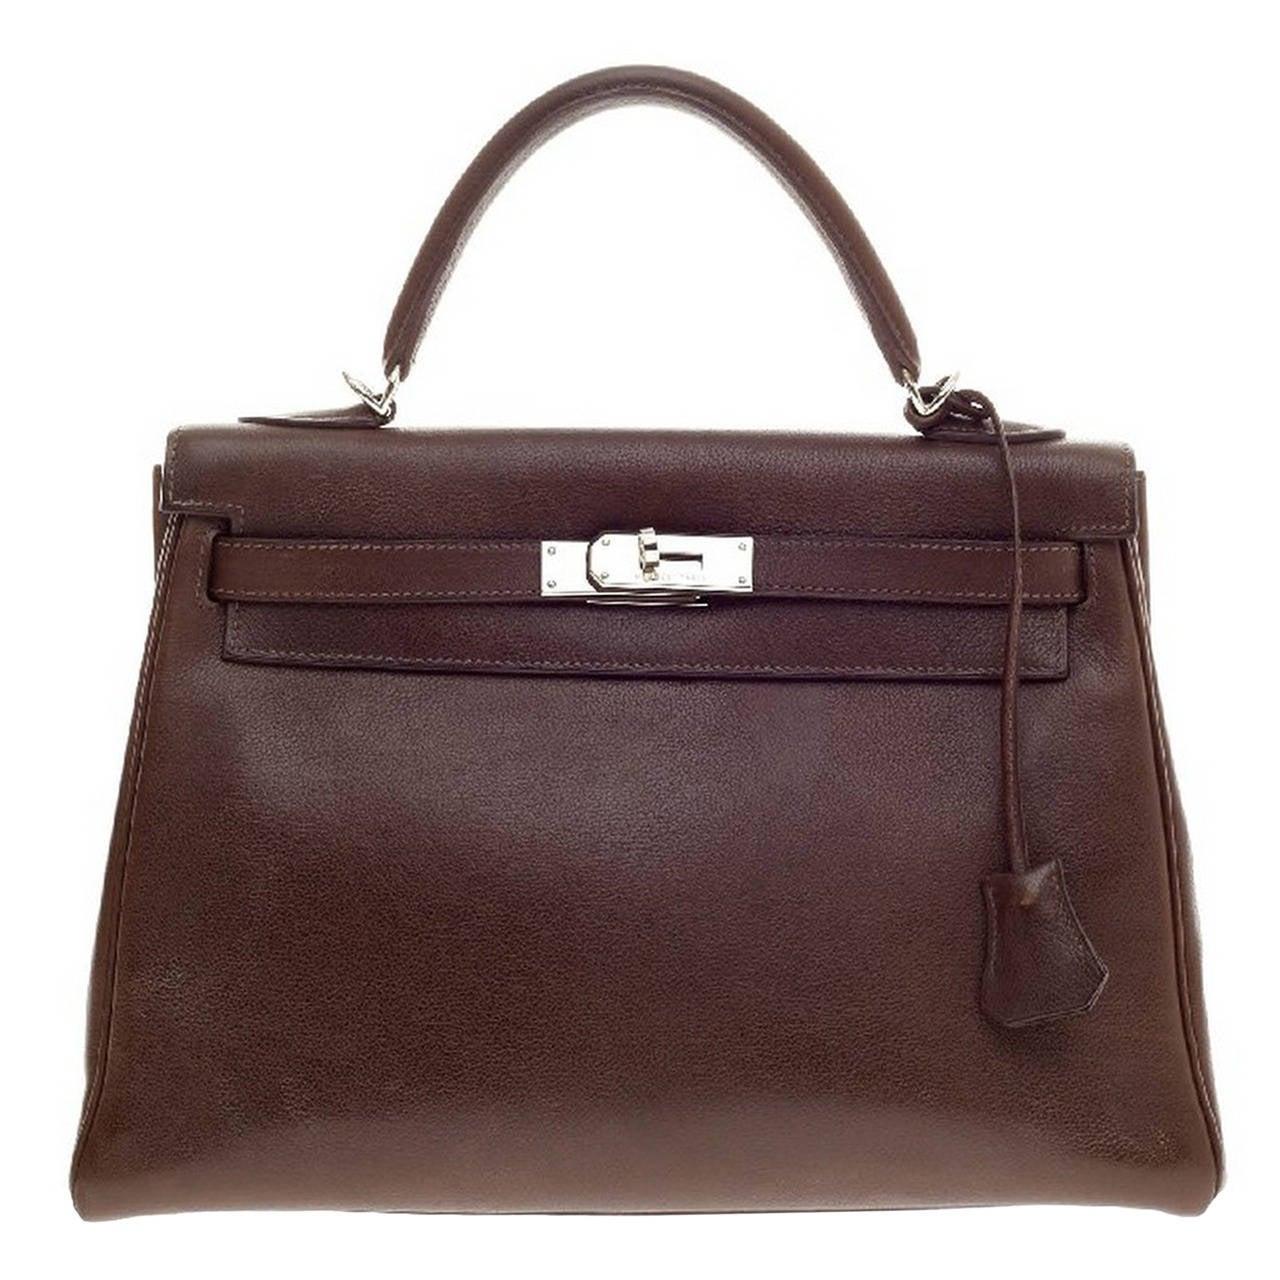 original hermes birkin handbags - Hermes Kelly Havane Evergrain with Palladium Hardware 32 at 1stdibs